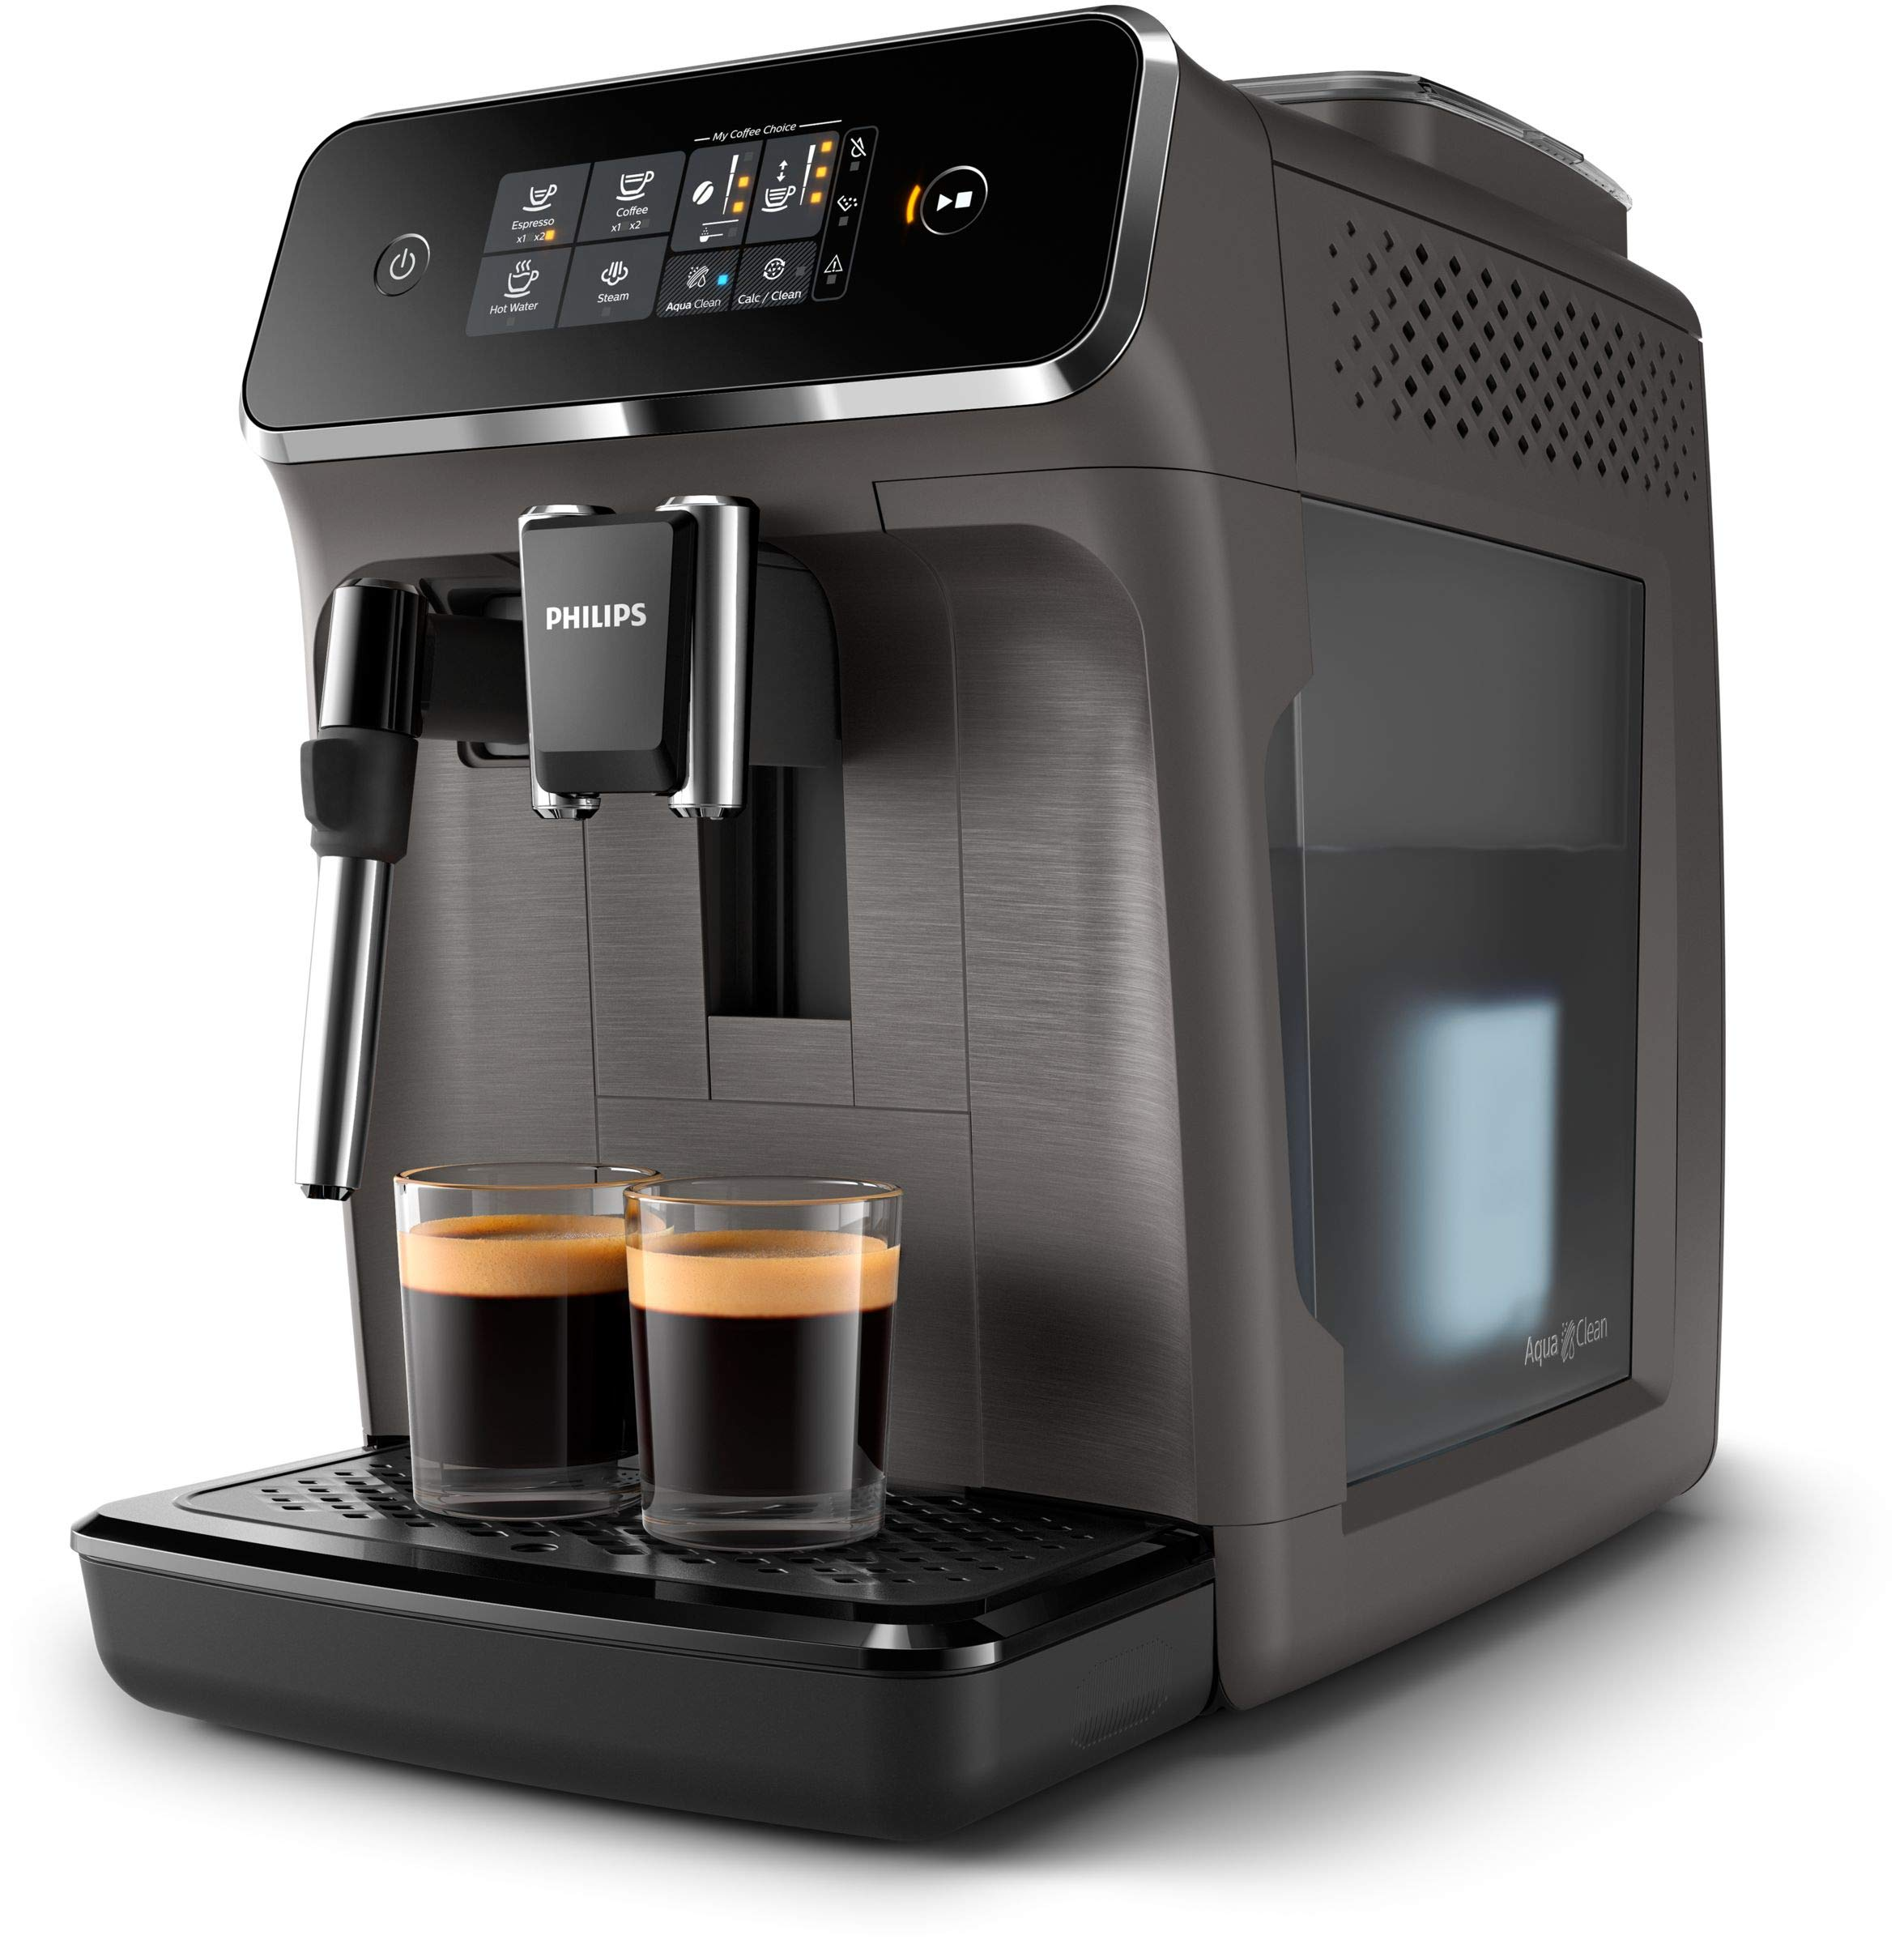 Philips-EP222410-2200-Serie-Kaffeevollautomat-Grau